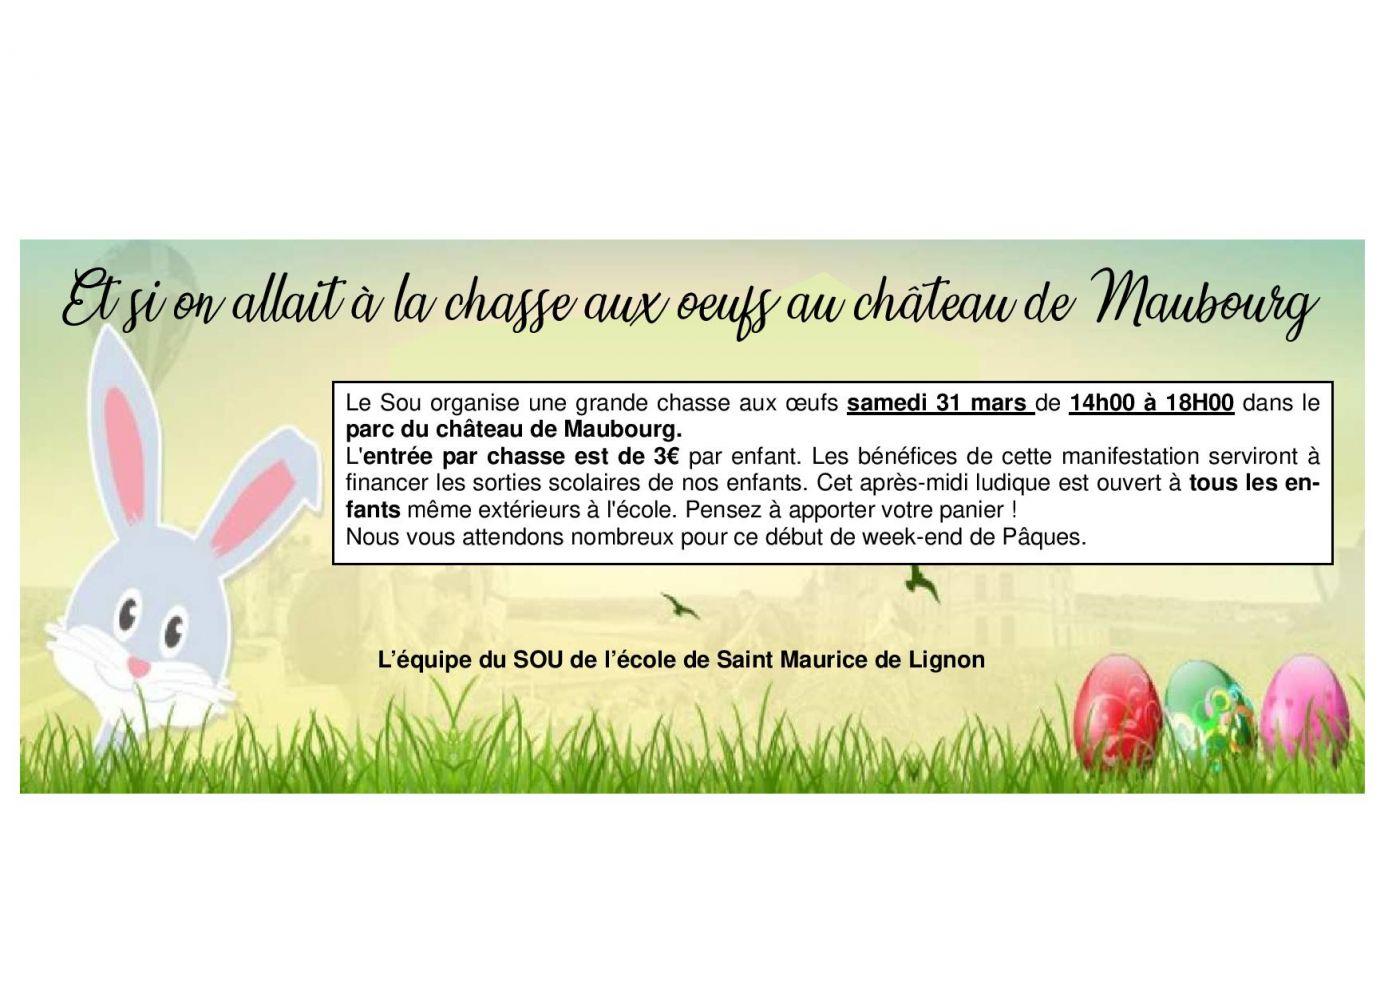 Pièce-jointe-chasse-aux-oeufs-pour-internet-mairie-page-001